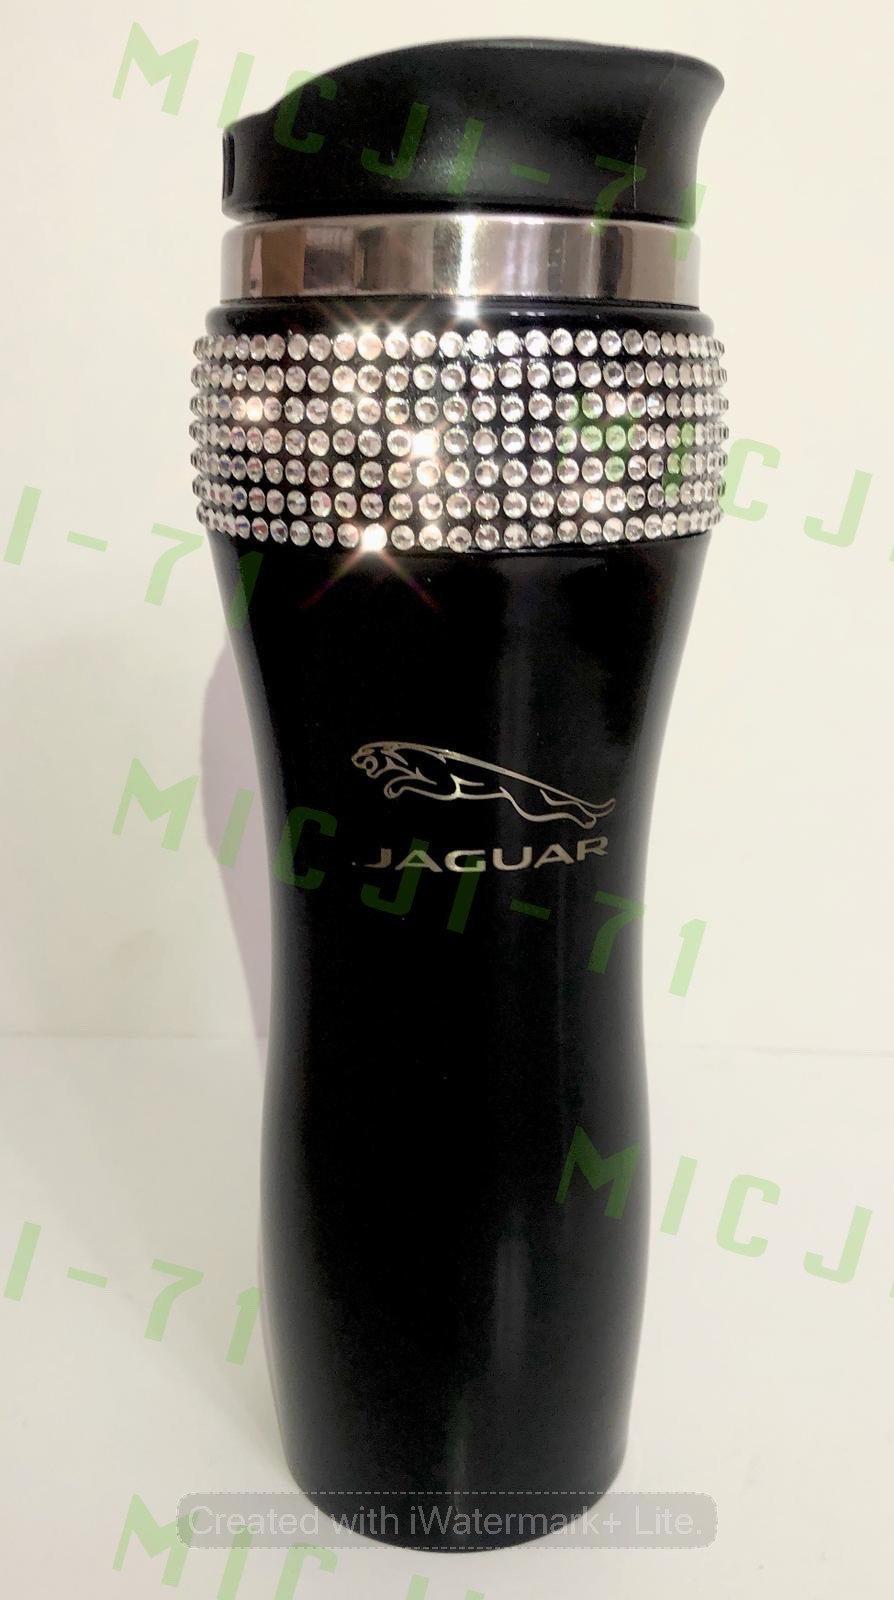 Jaguar (Black) Stainless Steel Thermal Bling Mug Tumbler Cup Travel 14oz Made wi - $29.99